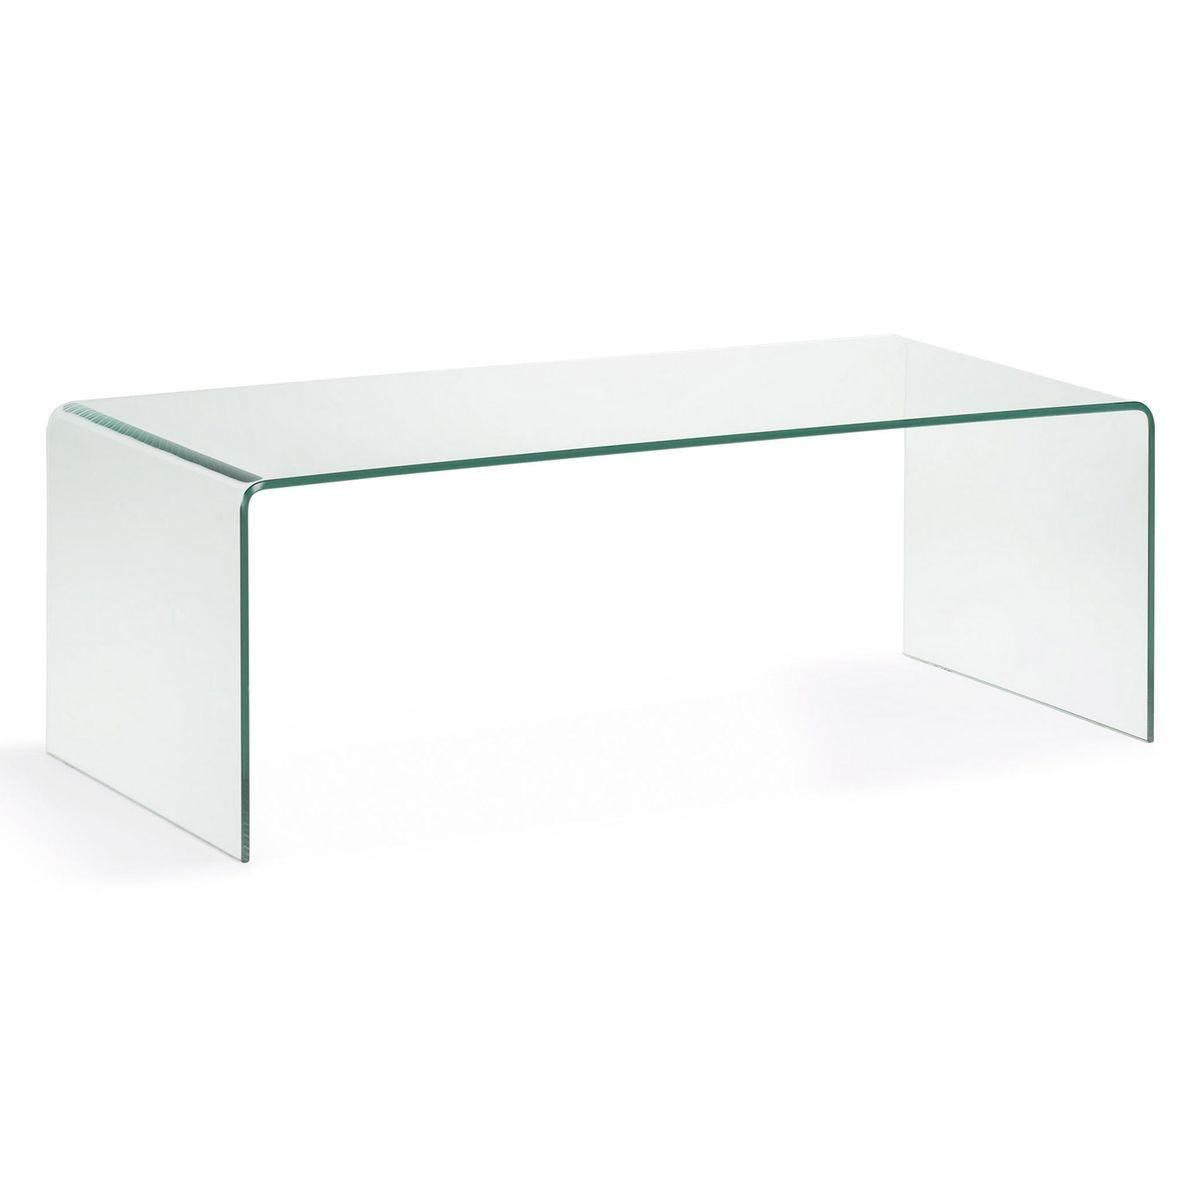 Une table basse en verre